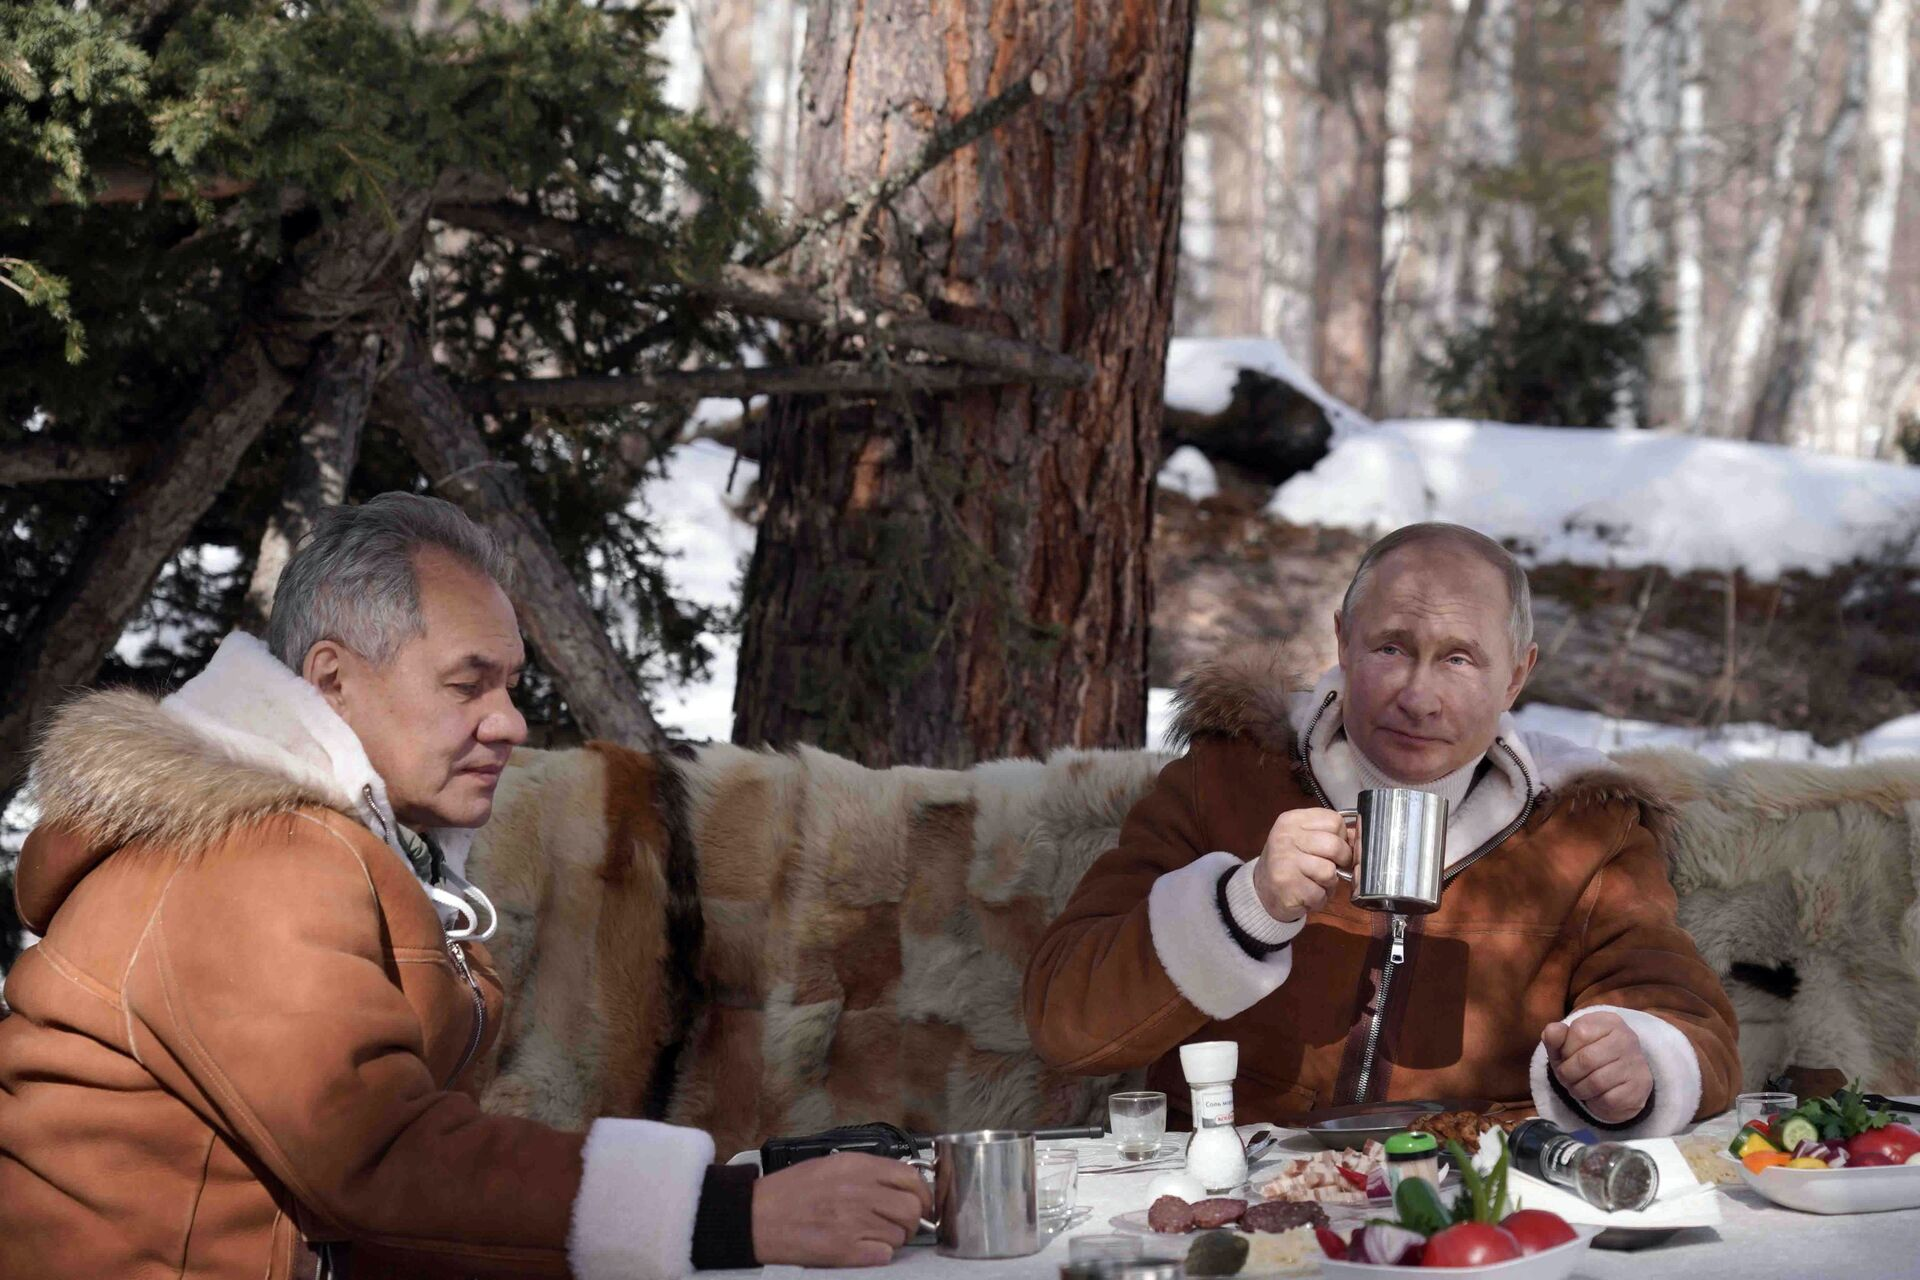 Ни речи од Бајдена – нема проблема: Путин повео Шојгуа у пустоловину по Сибиру /видео/ - Sputnik Србија, 1920, 21.03.2021